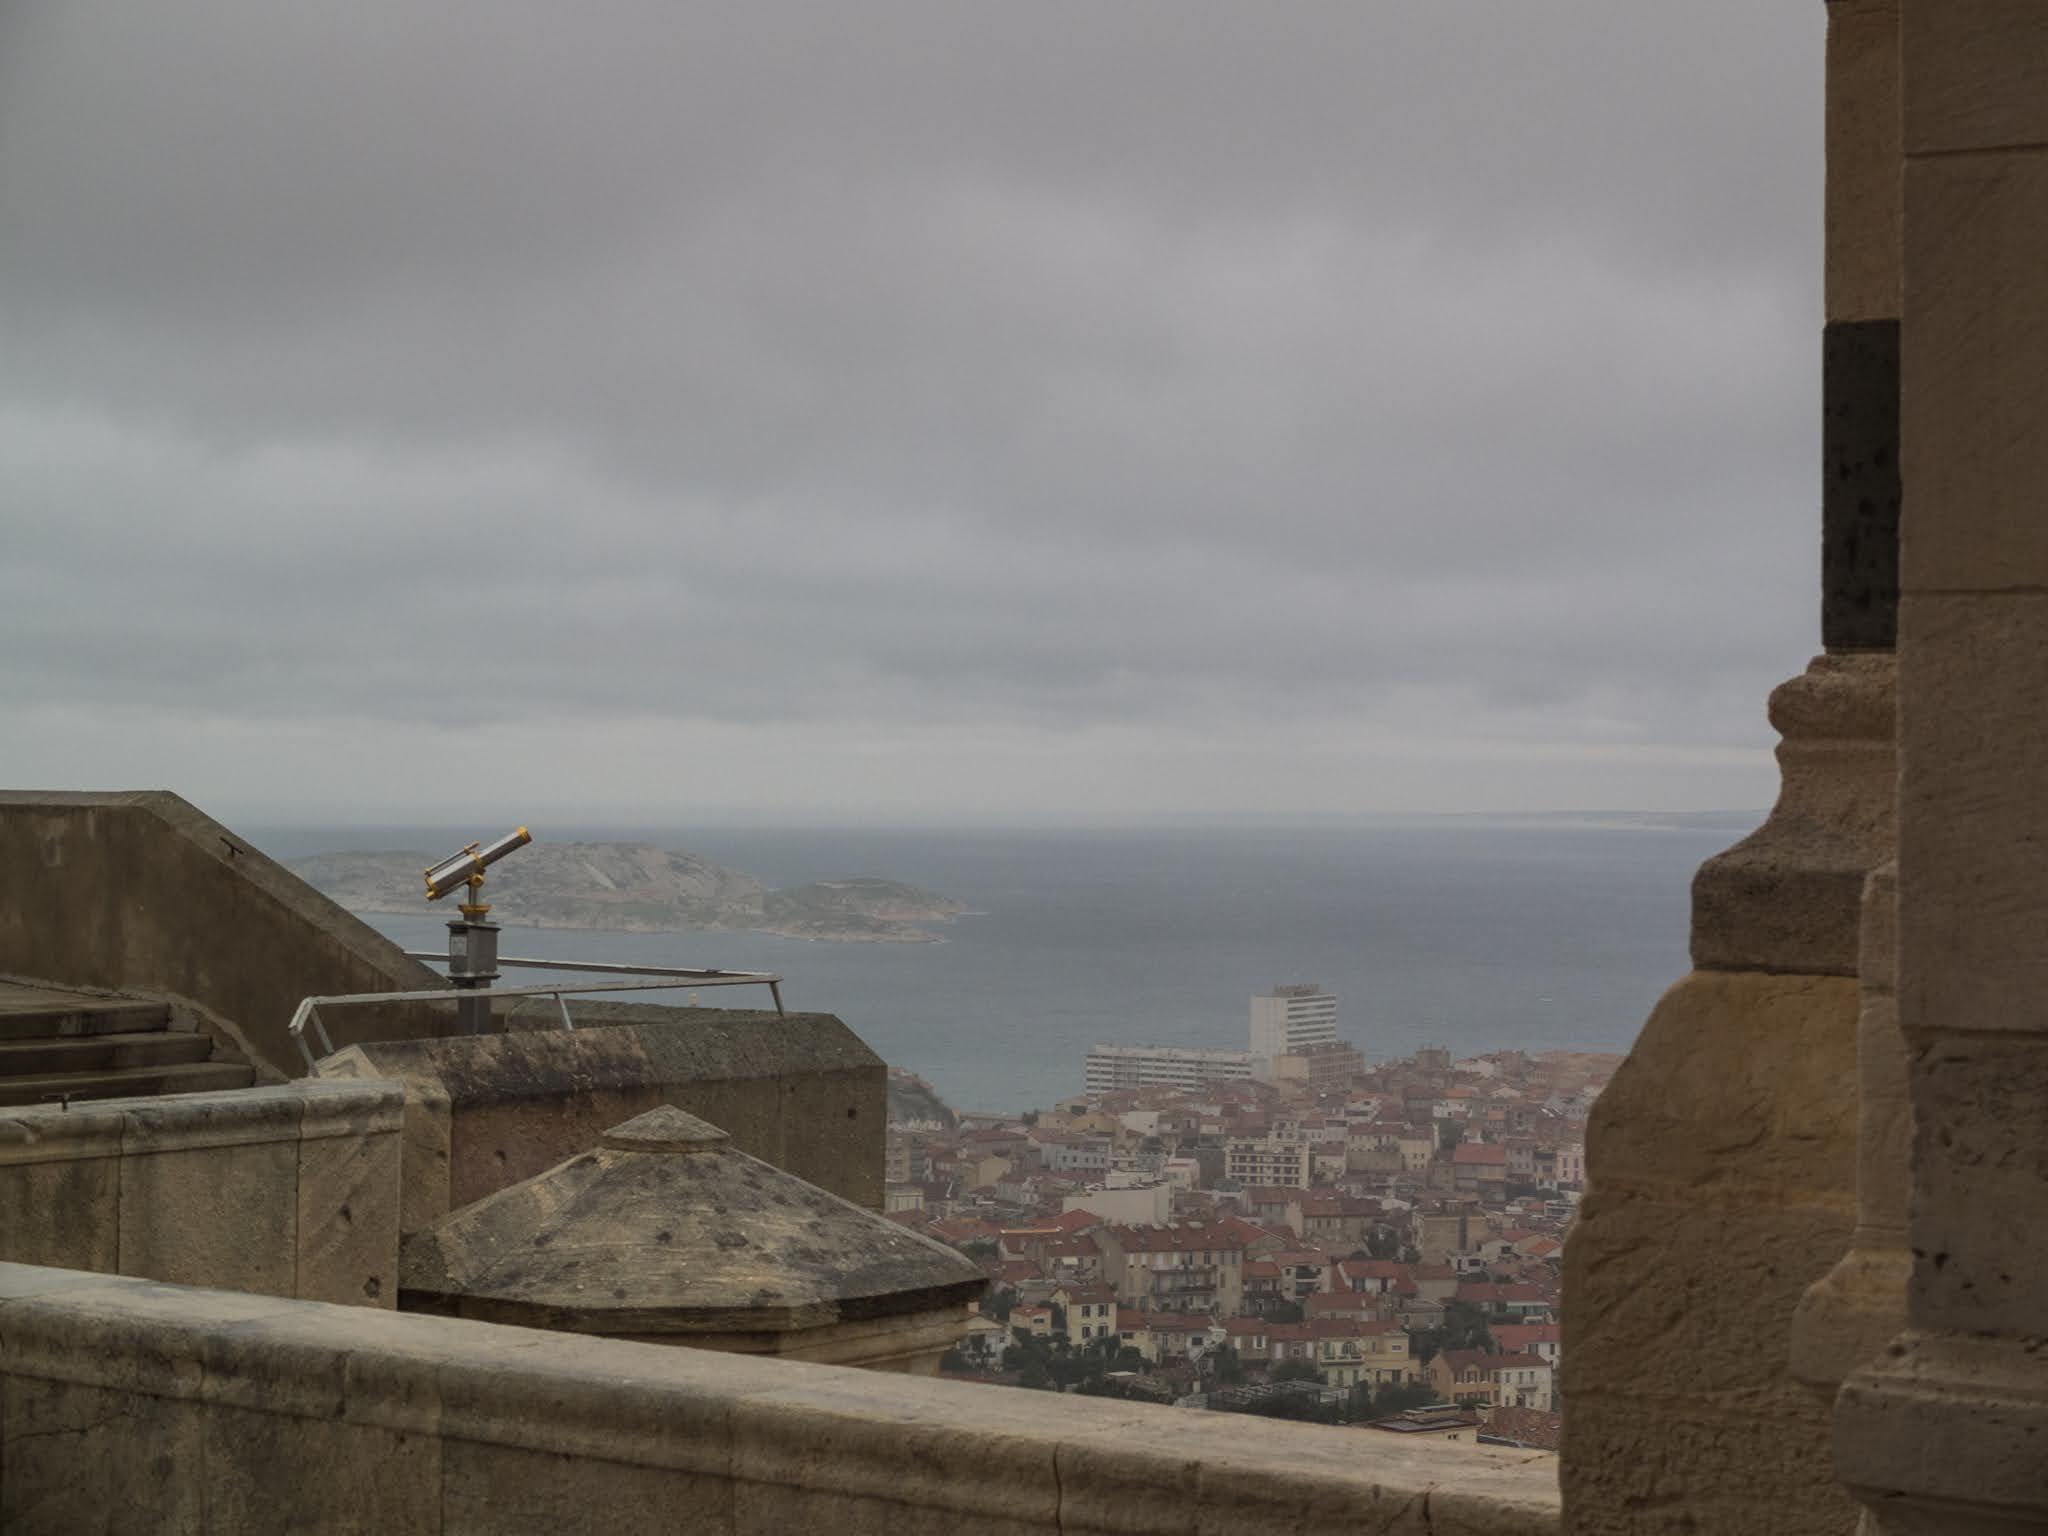 A brass telescope overlooking Marseille at the Basilica of Notre Dame de la Garde.